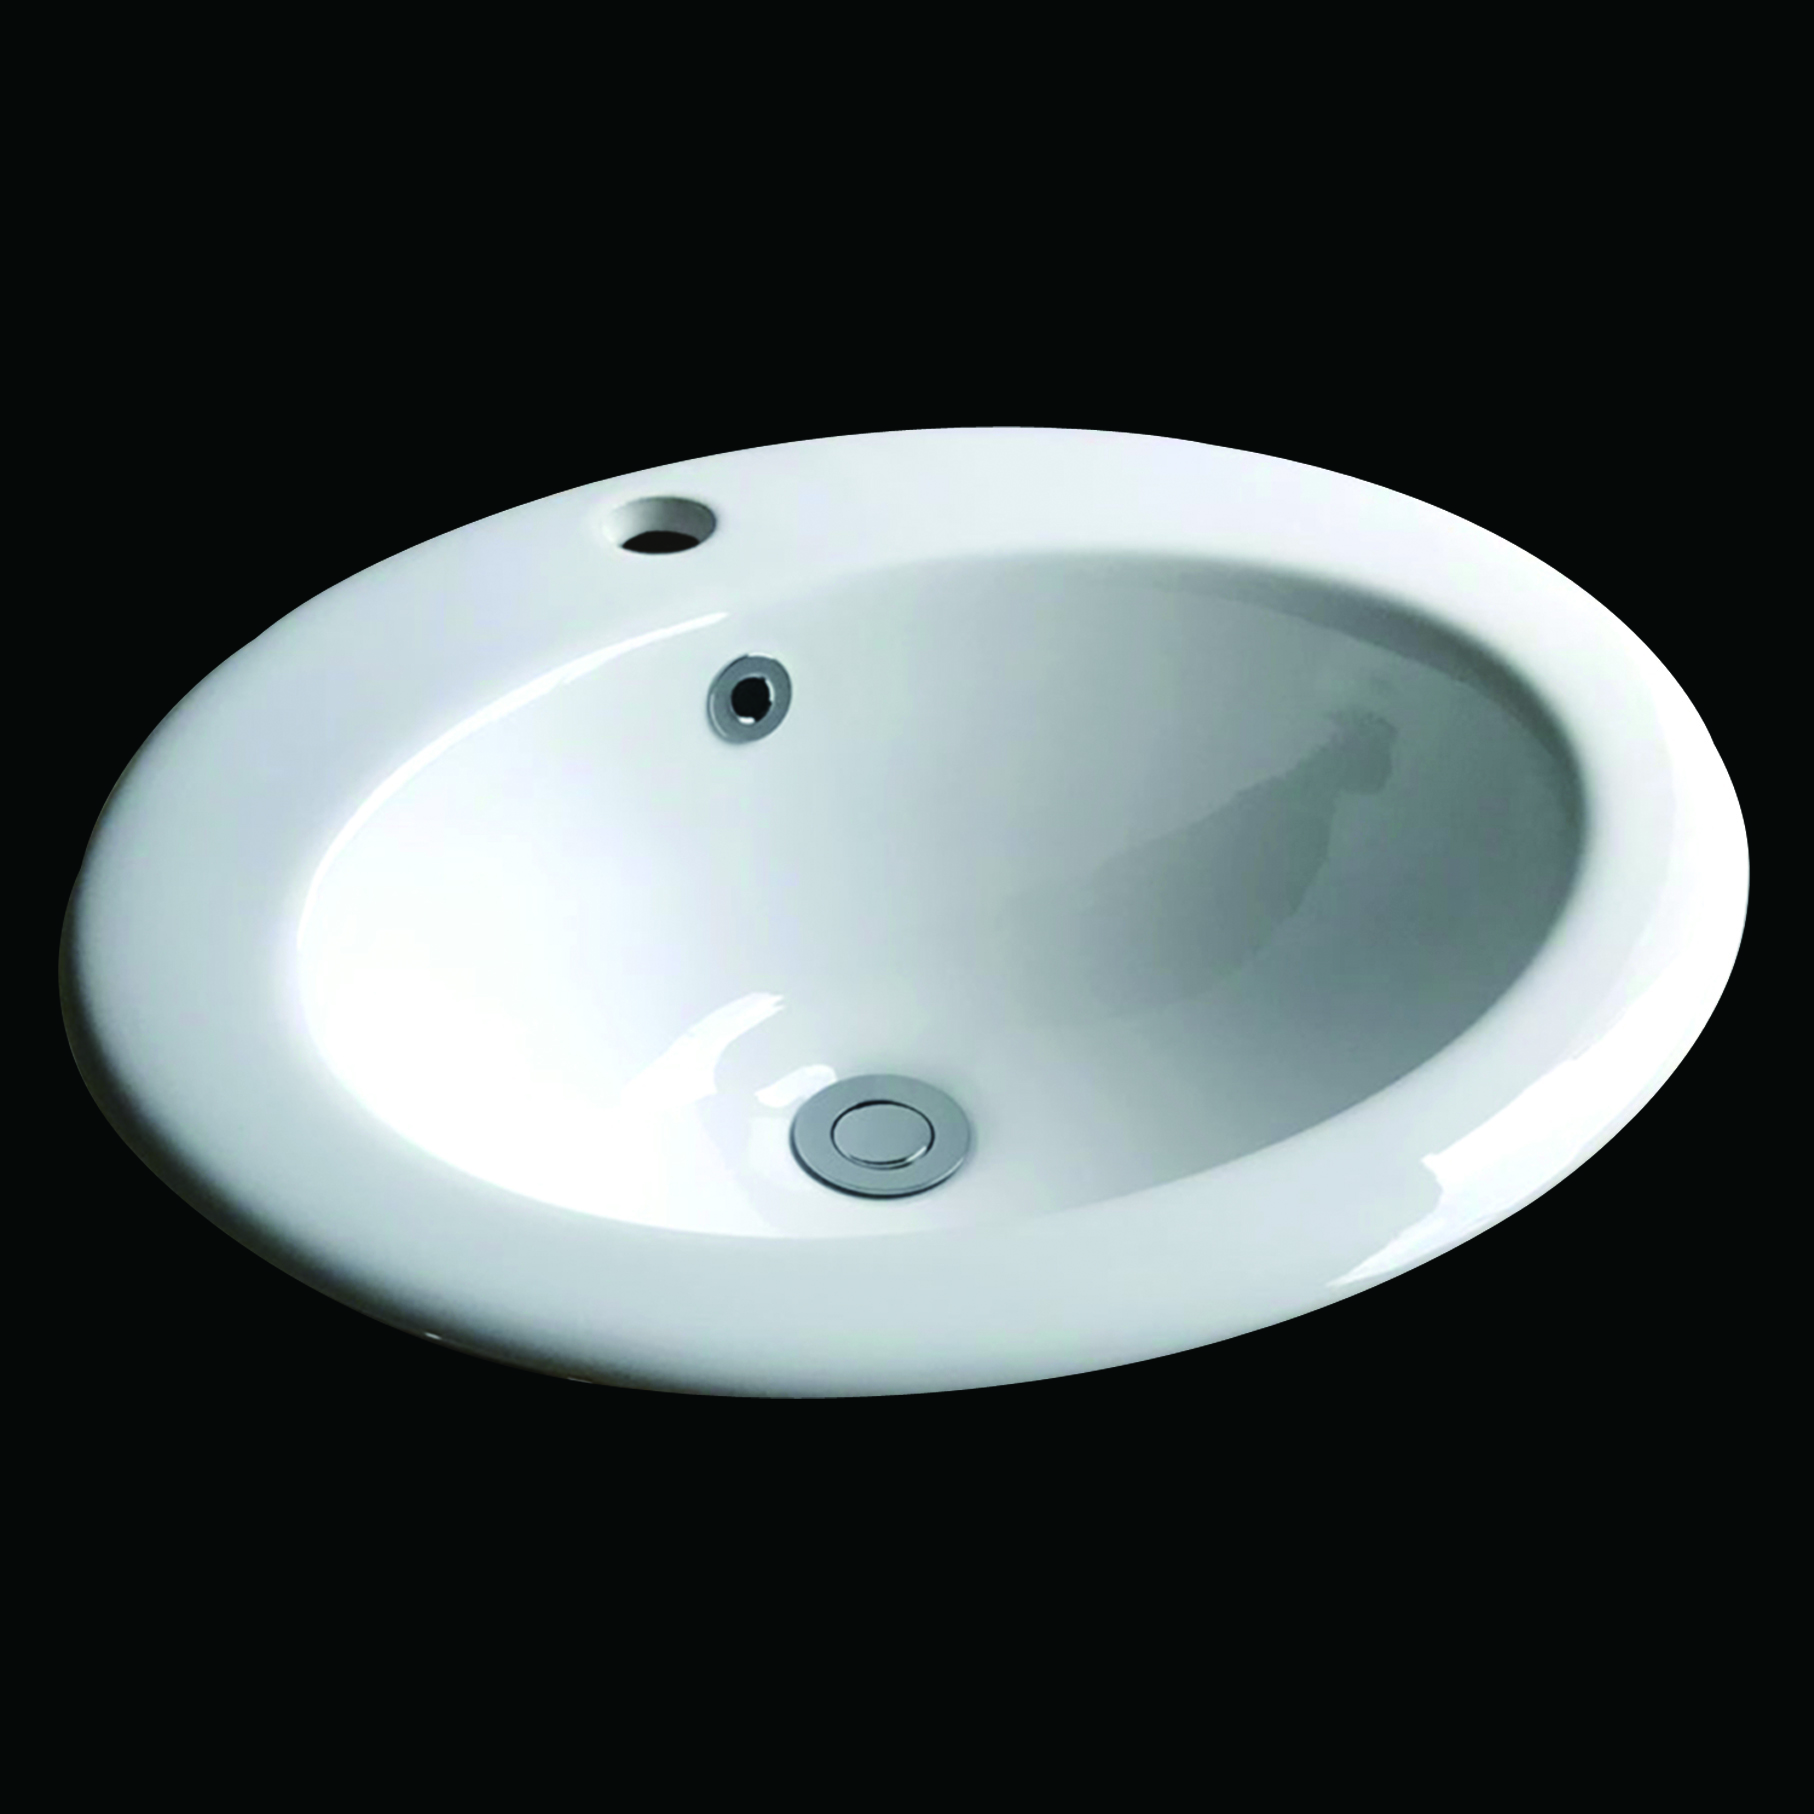 Big Size 20 Inch Oval Under Counter Mounted Ceramic Basin Bathroom Vanity Undermount Sink Basin Buy Oval Under Counter Basin Bathroom Vanity Sink Ceramic Undermount Sink Product On Alibaba Com